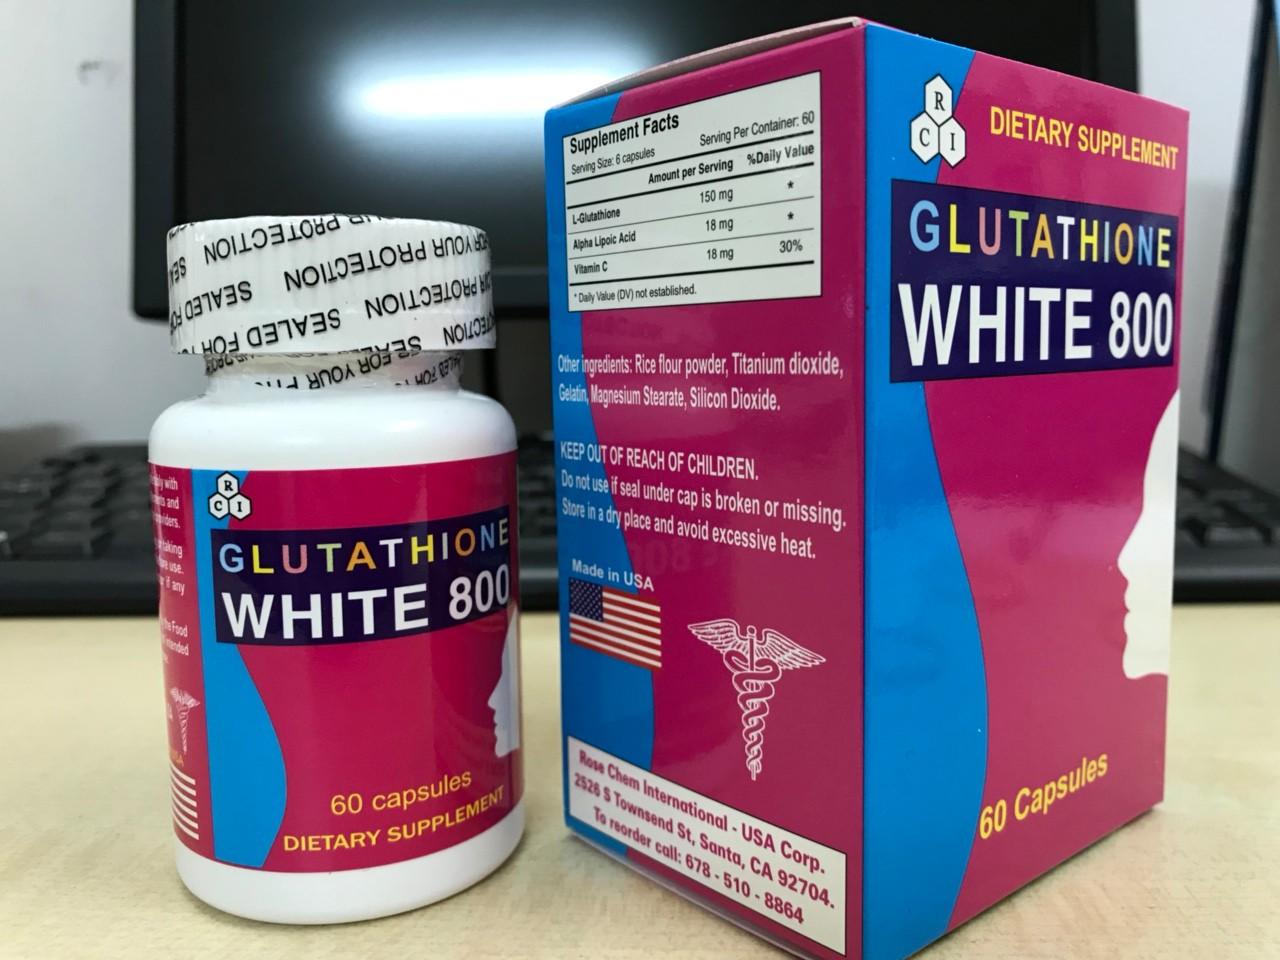 Viên uống Glutathione White 800